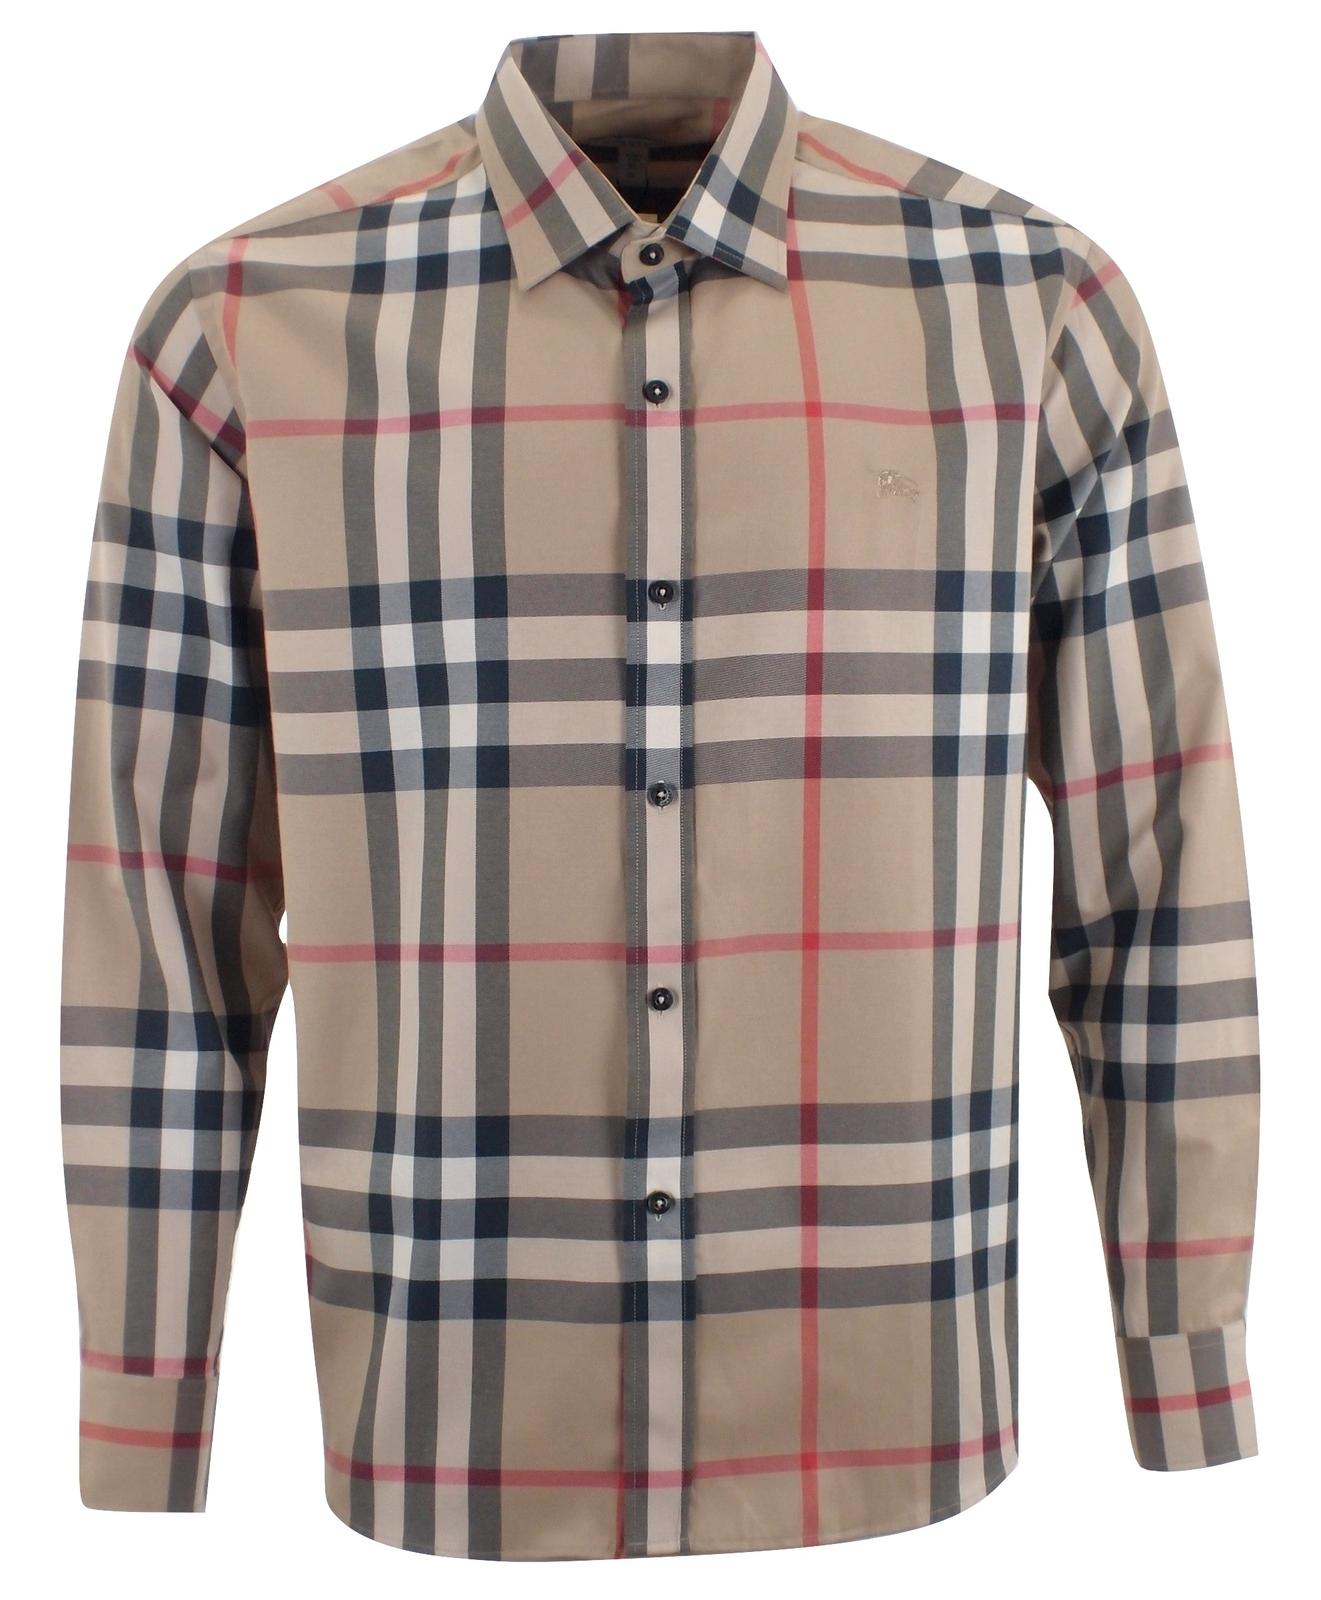 12d1a574 Burberry Brit Men's Long Sleeve 100% Cotton and 29 similar items. 1 pb070208